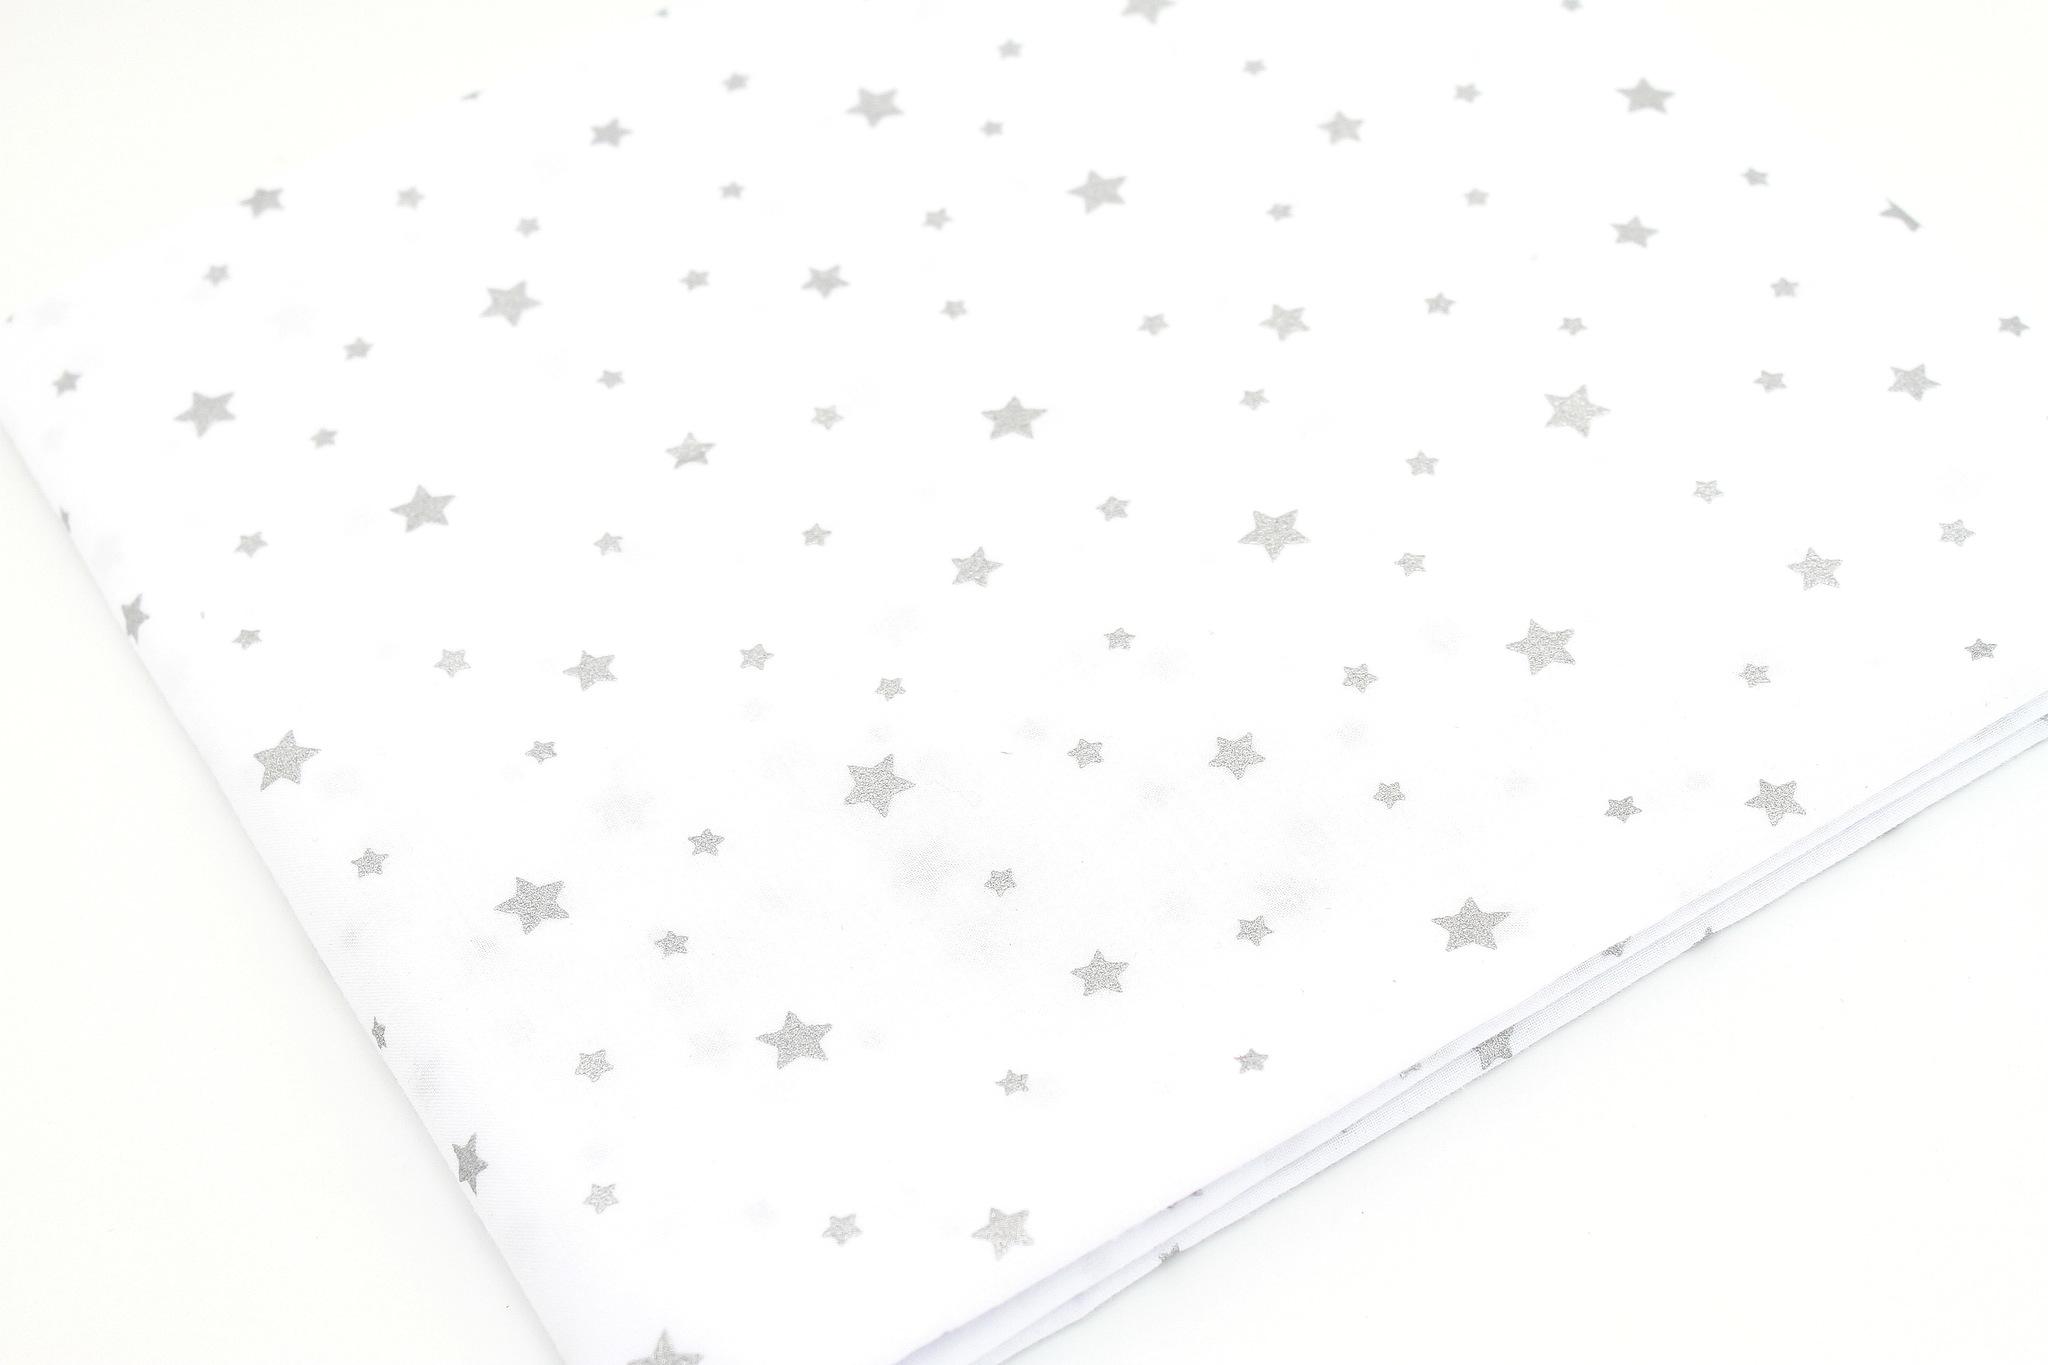 Звезды серебро(глиттер), на белом